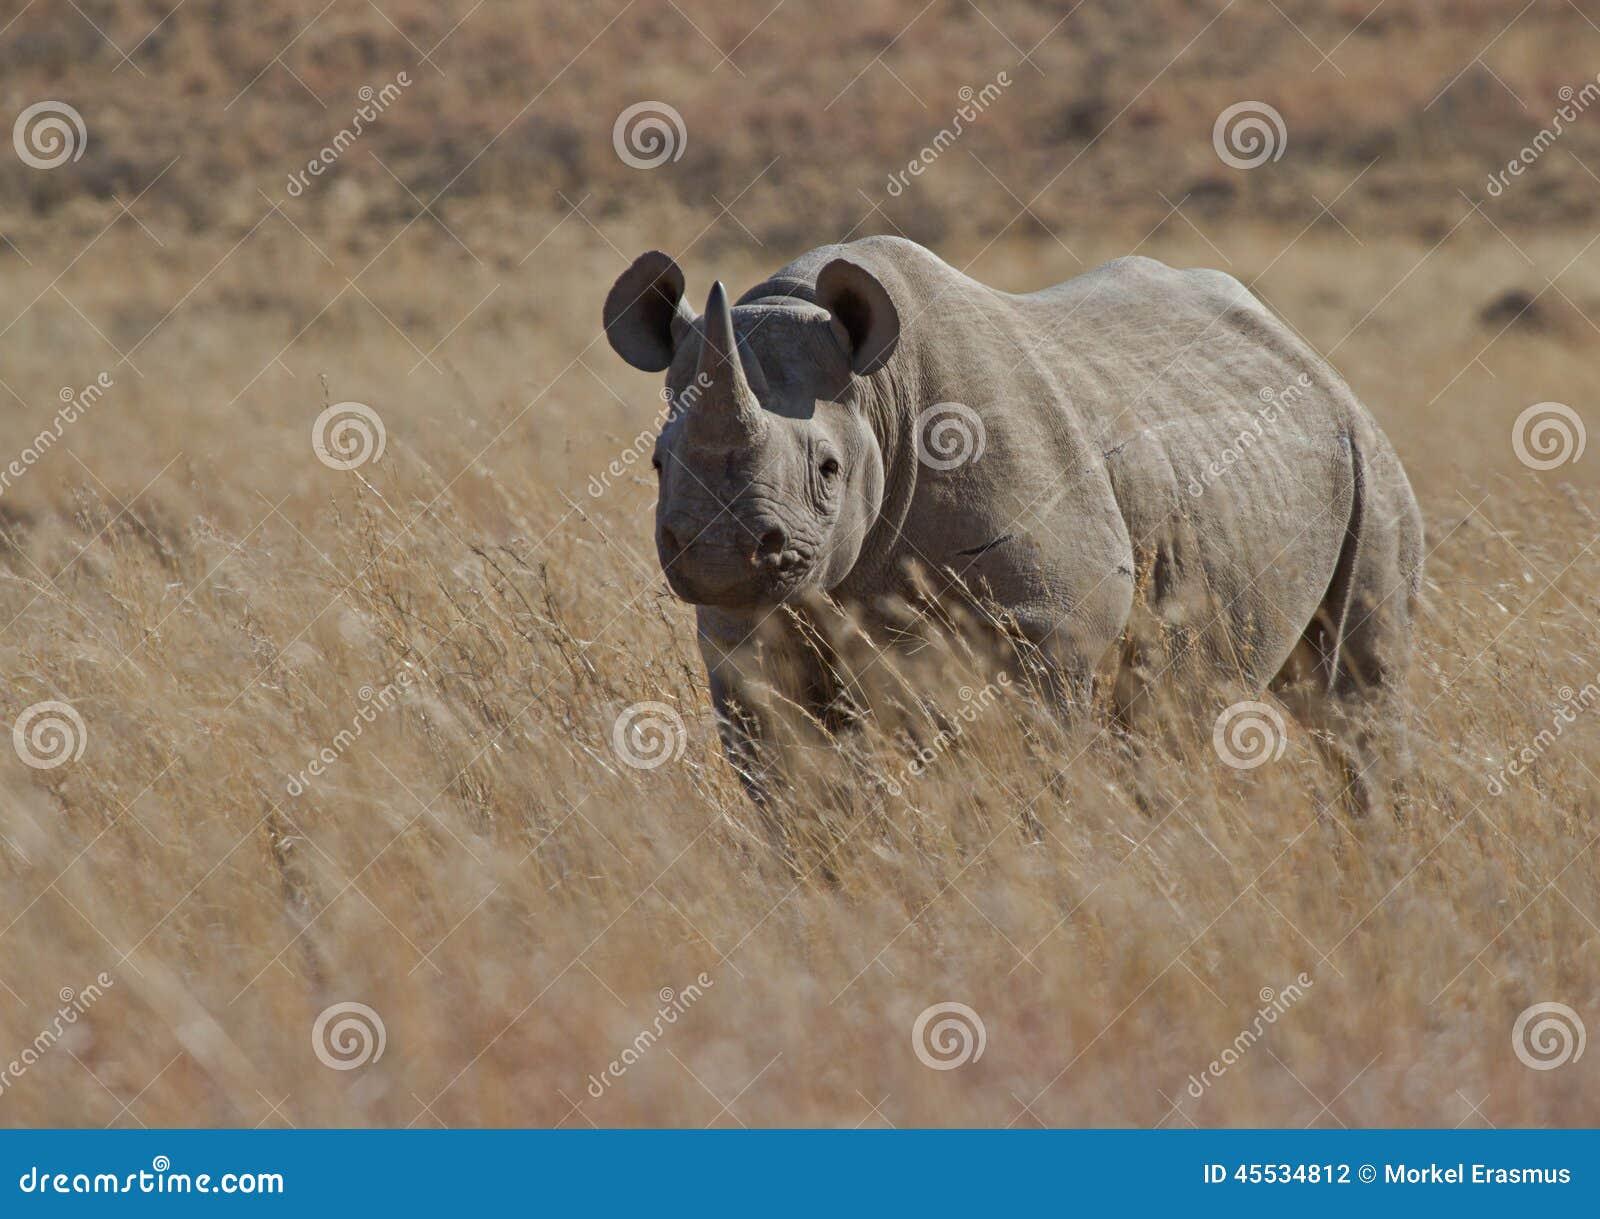 Black Rhino male on an African plain